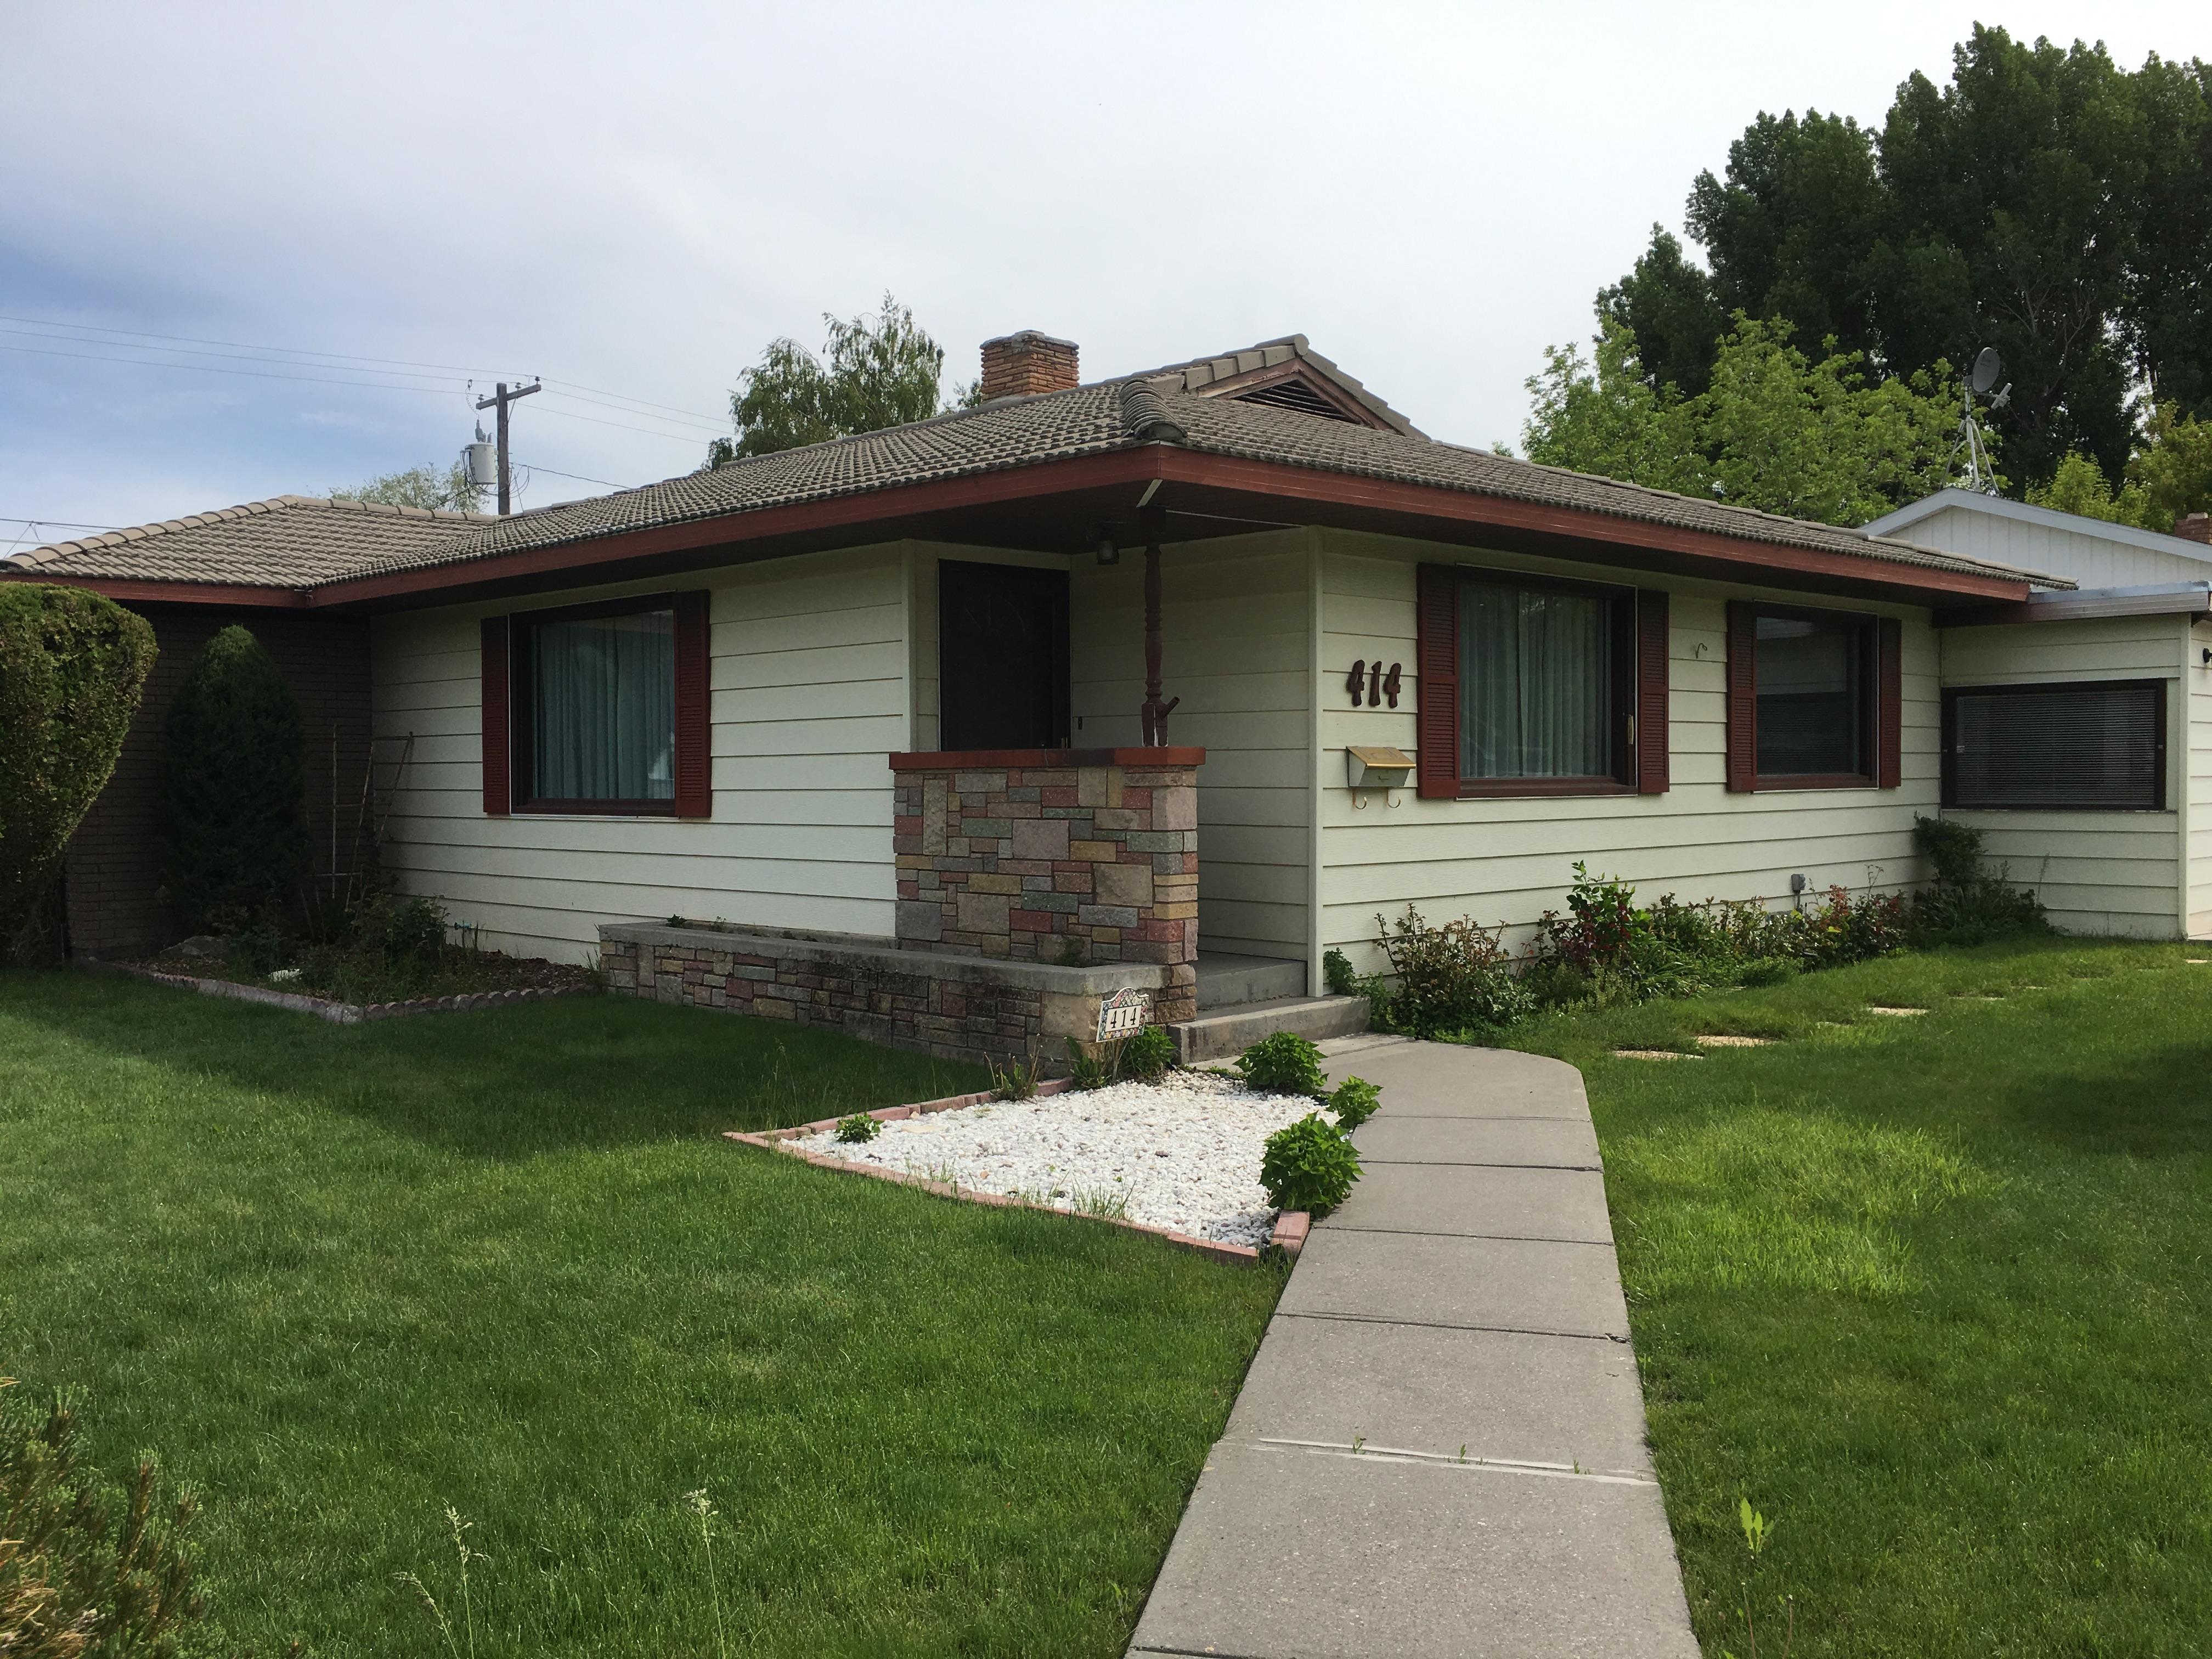 414 14th St, Rupert, Idaho